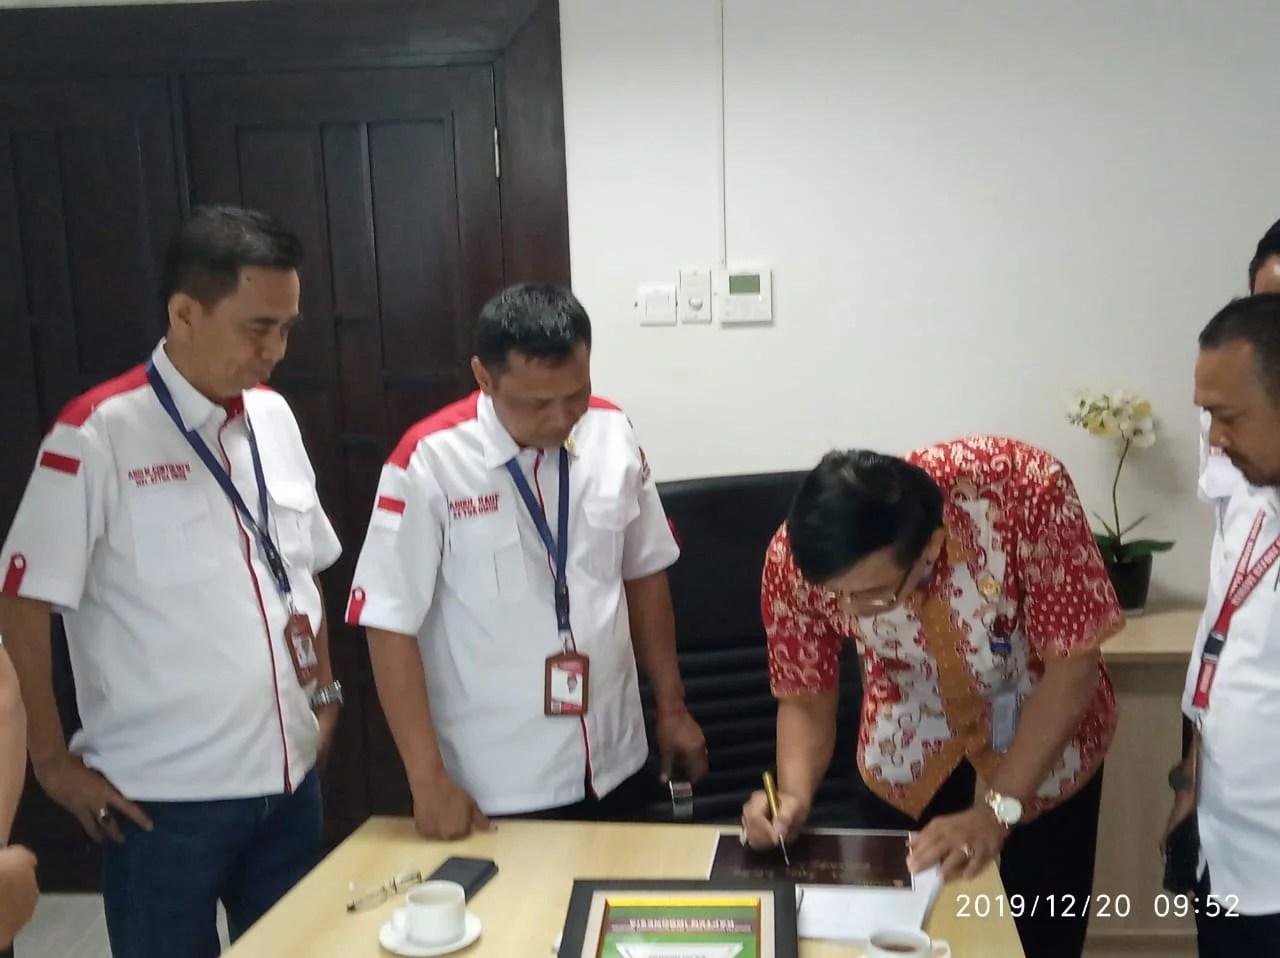 Sambangi Kementerian ESDM Kapten Indonesia Sampaikan Tentang Pola Kerja